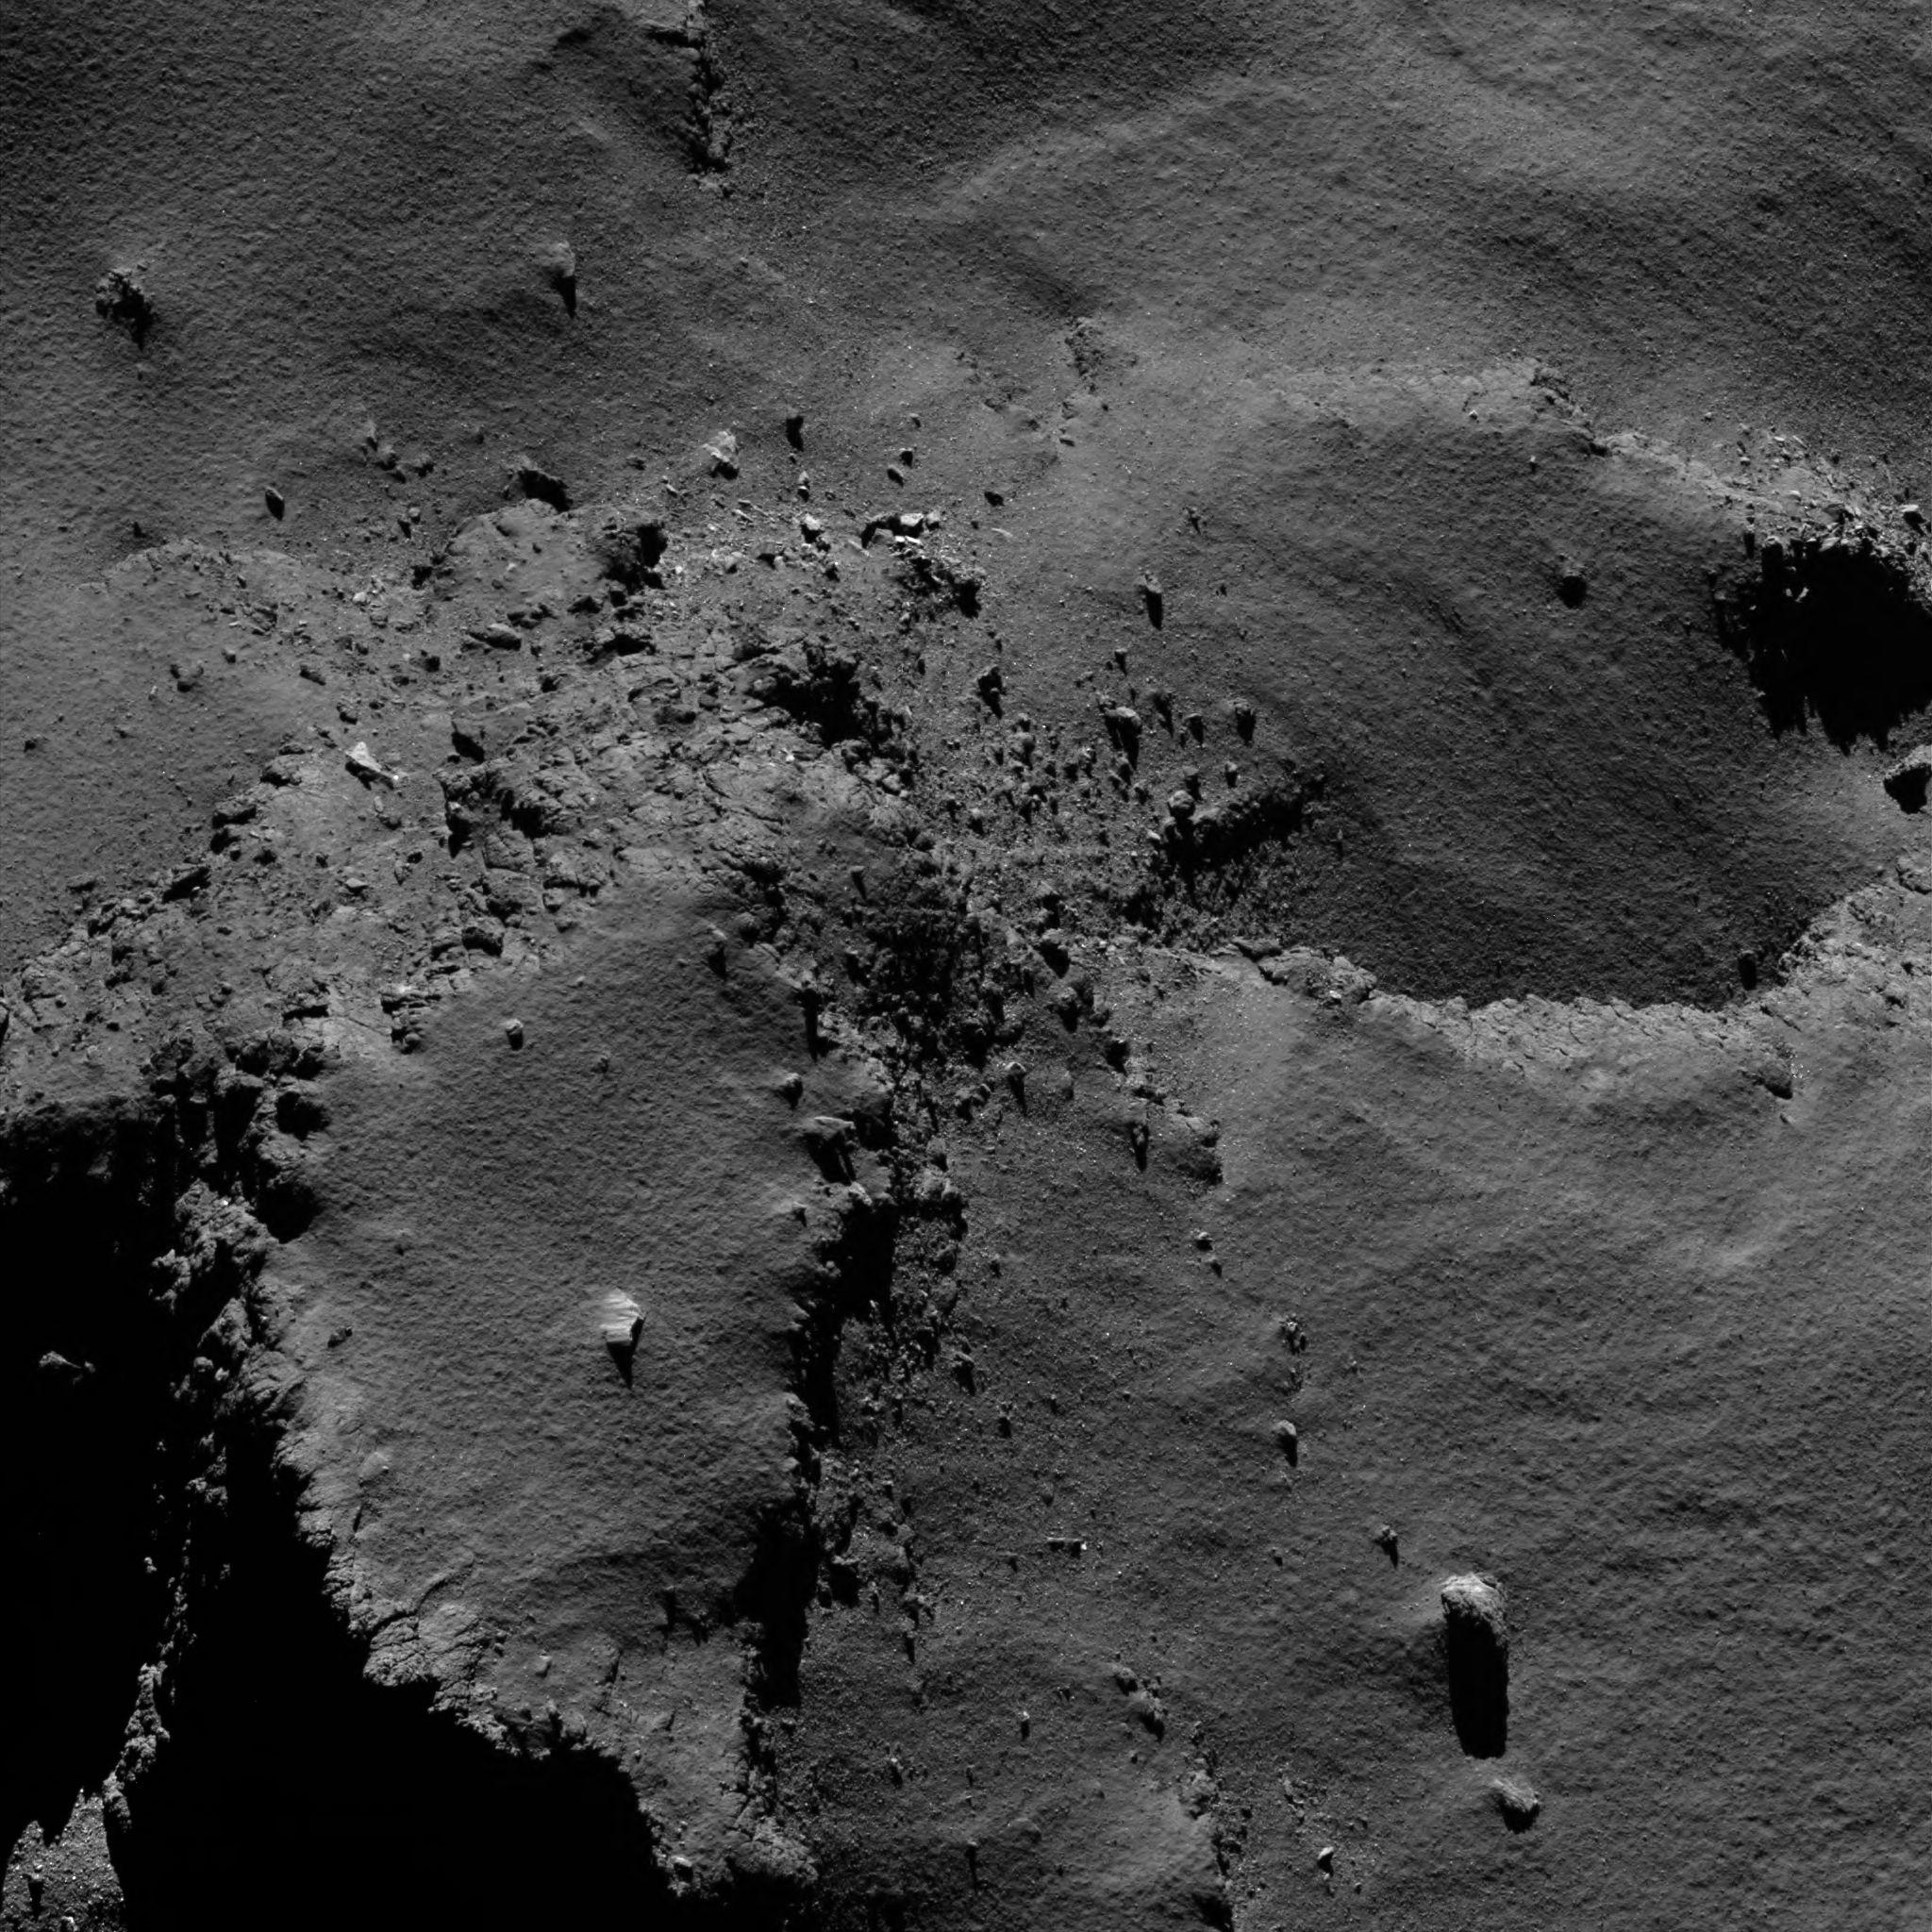 1567215487846-Rosetta_OSIRIS_NAC_comet_67P_20160803T135348.jpg